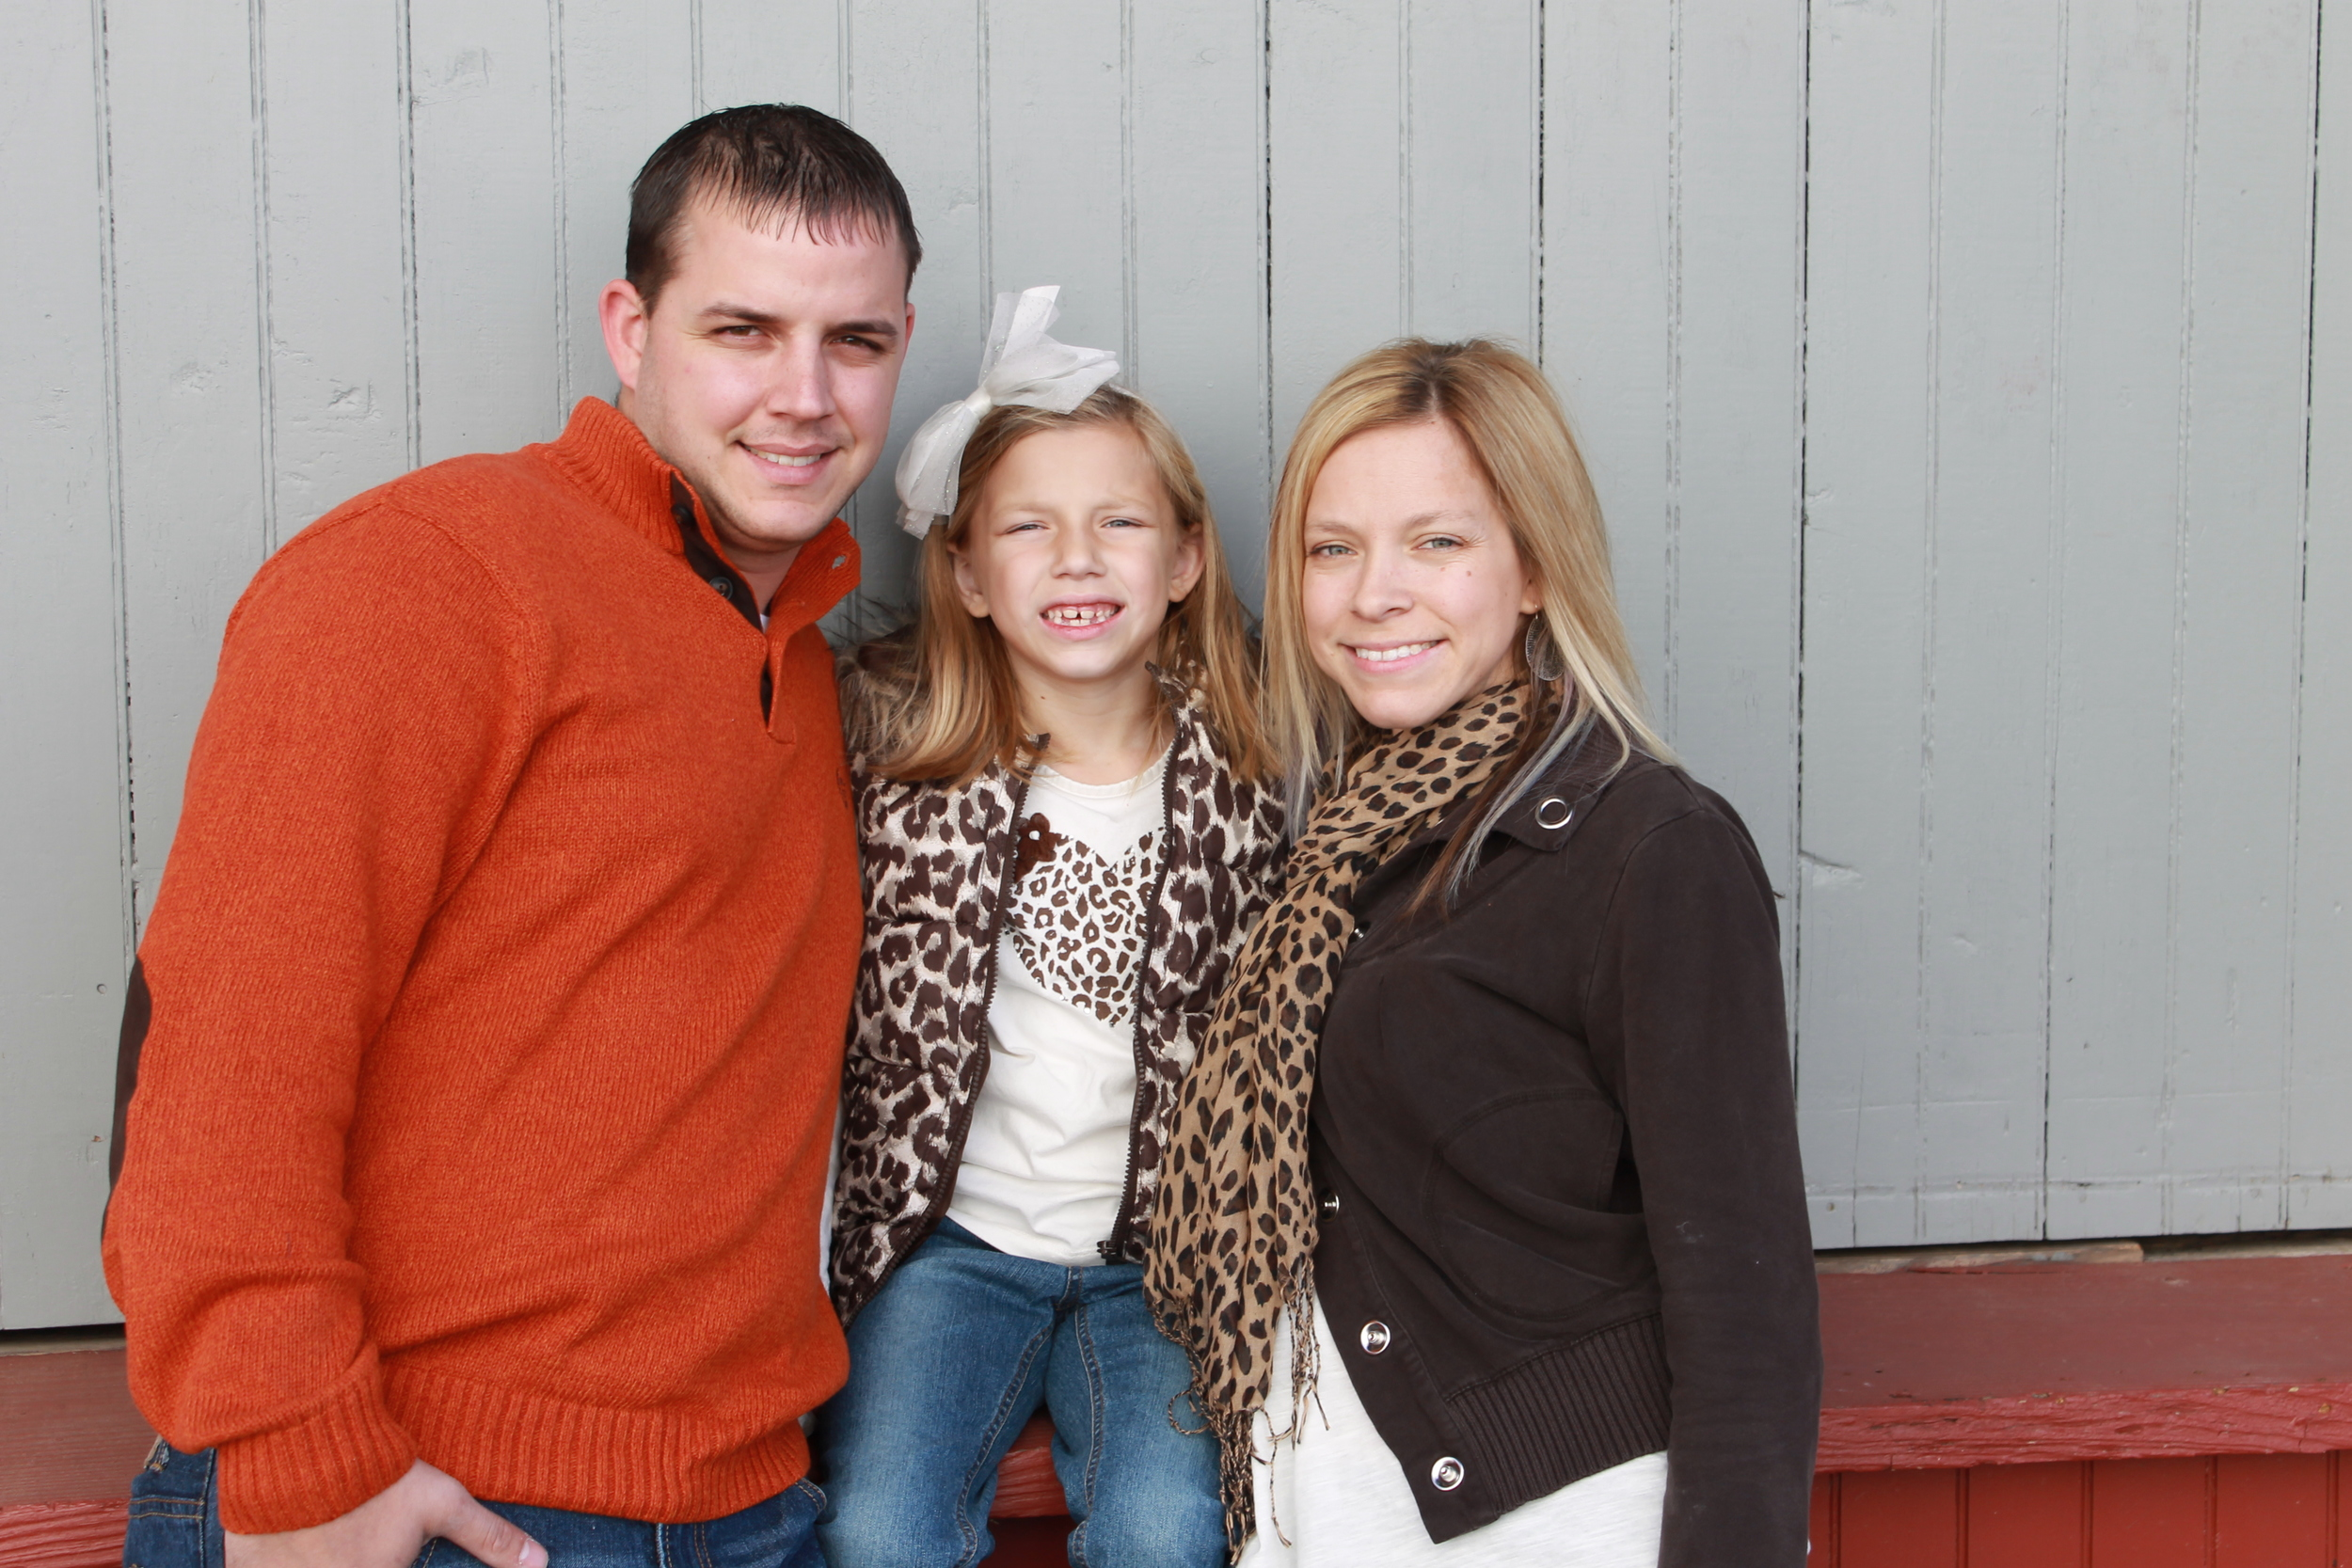 Fall Family Photos   Jess Rudolph Photography: www.jessrudolph.com